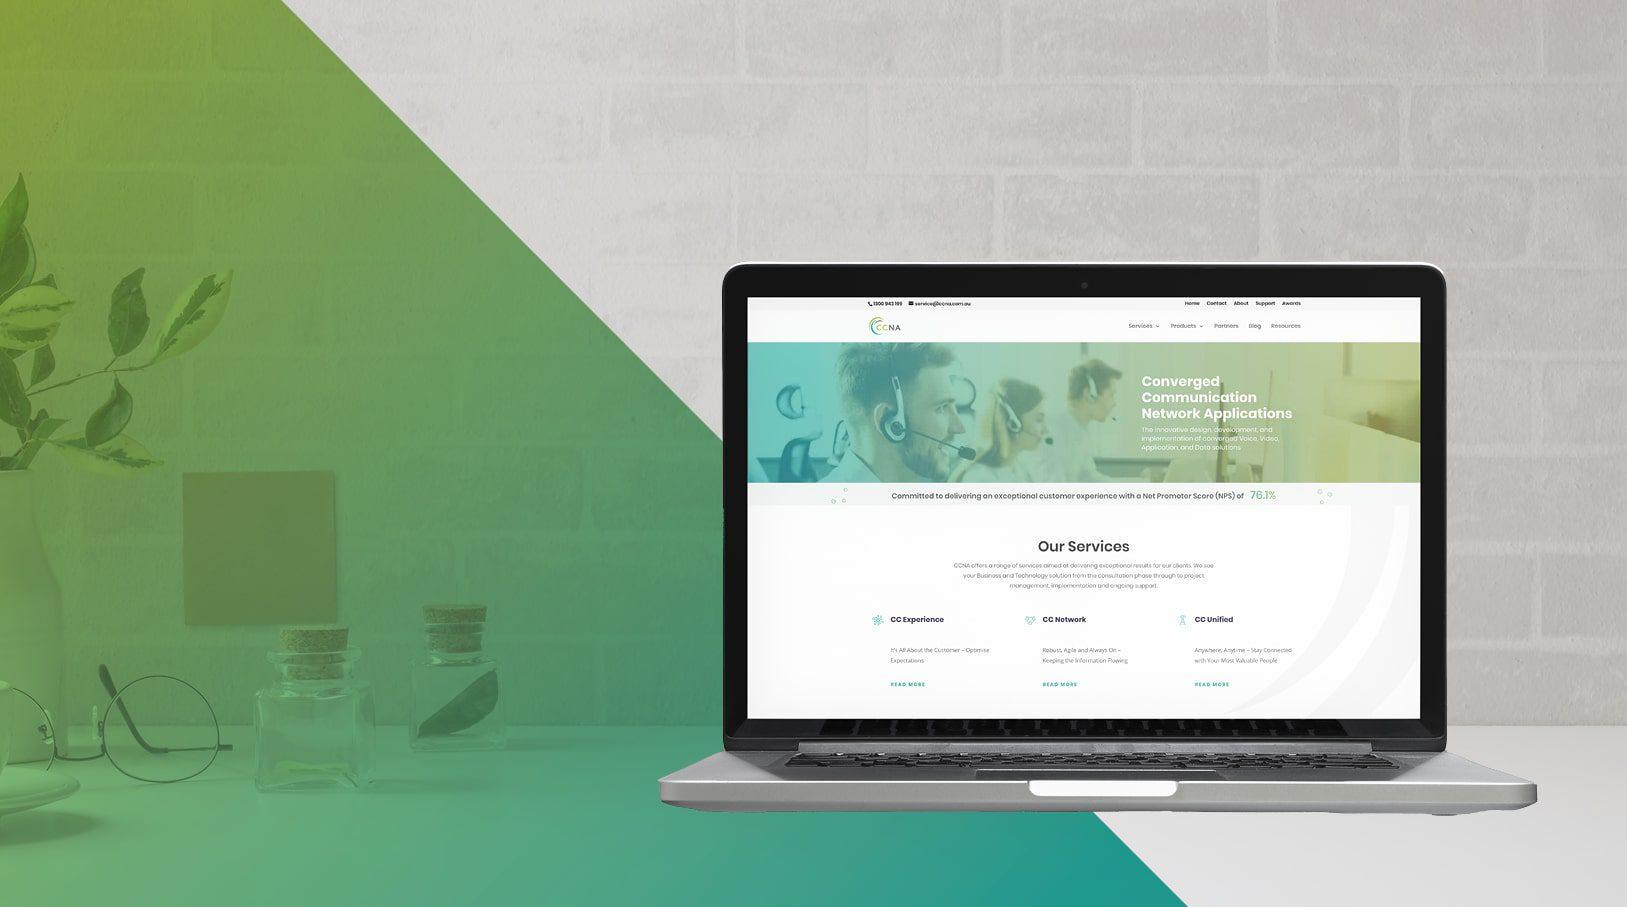 CCNA rebrand, new visual identity, and website.